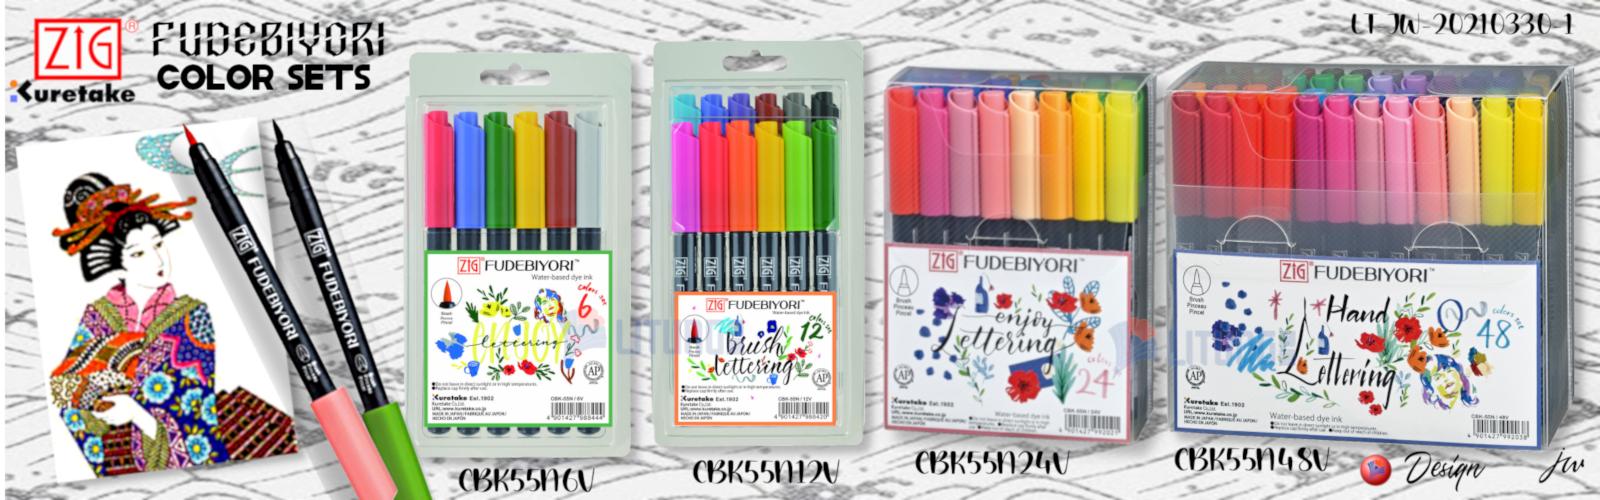 Banner ZIG CBK55N6V FUDEBIYORI 日和毛筆6色套裝 LTLogo 1600x500